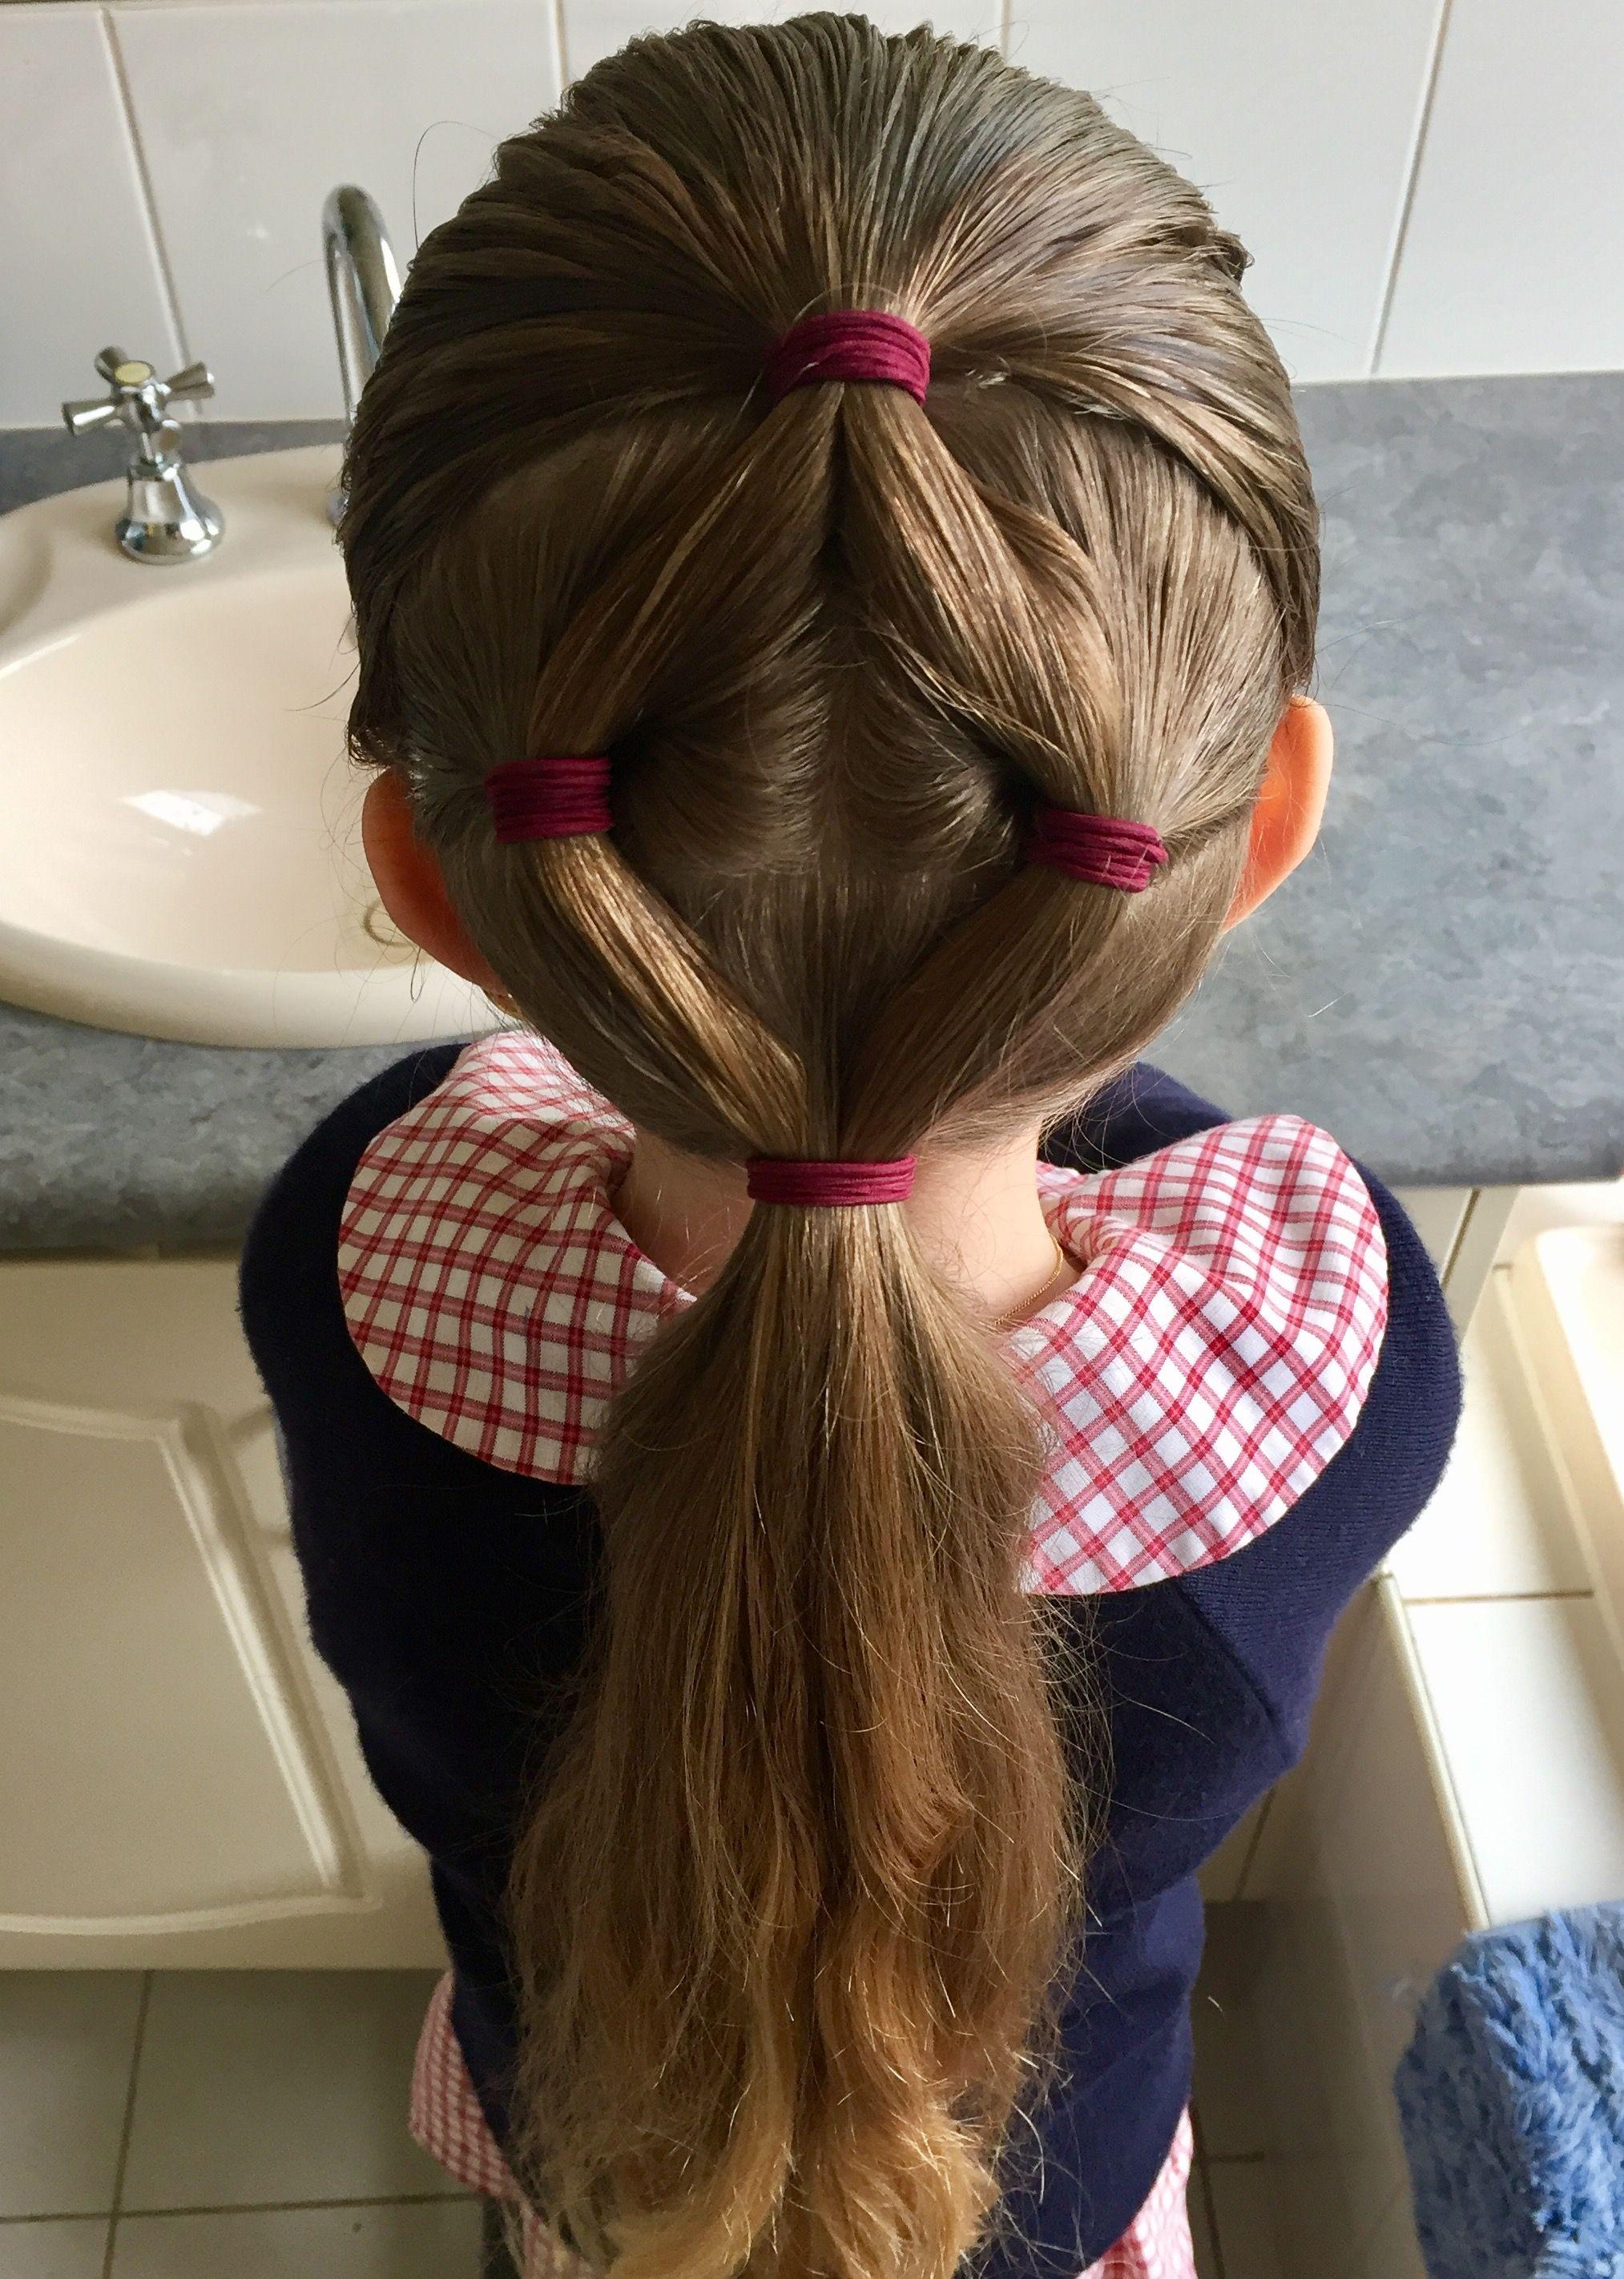 Little girls hair niños pinterest girl hair girls and hair style